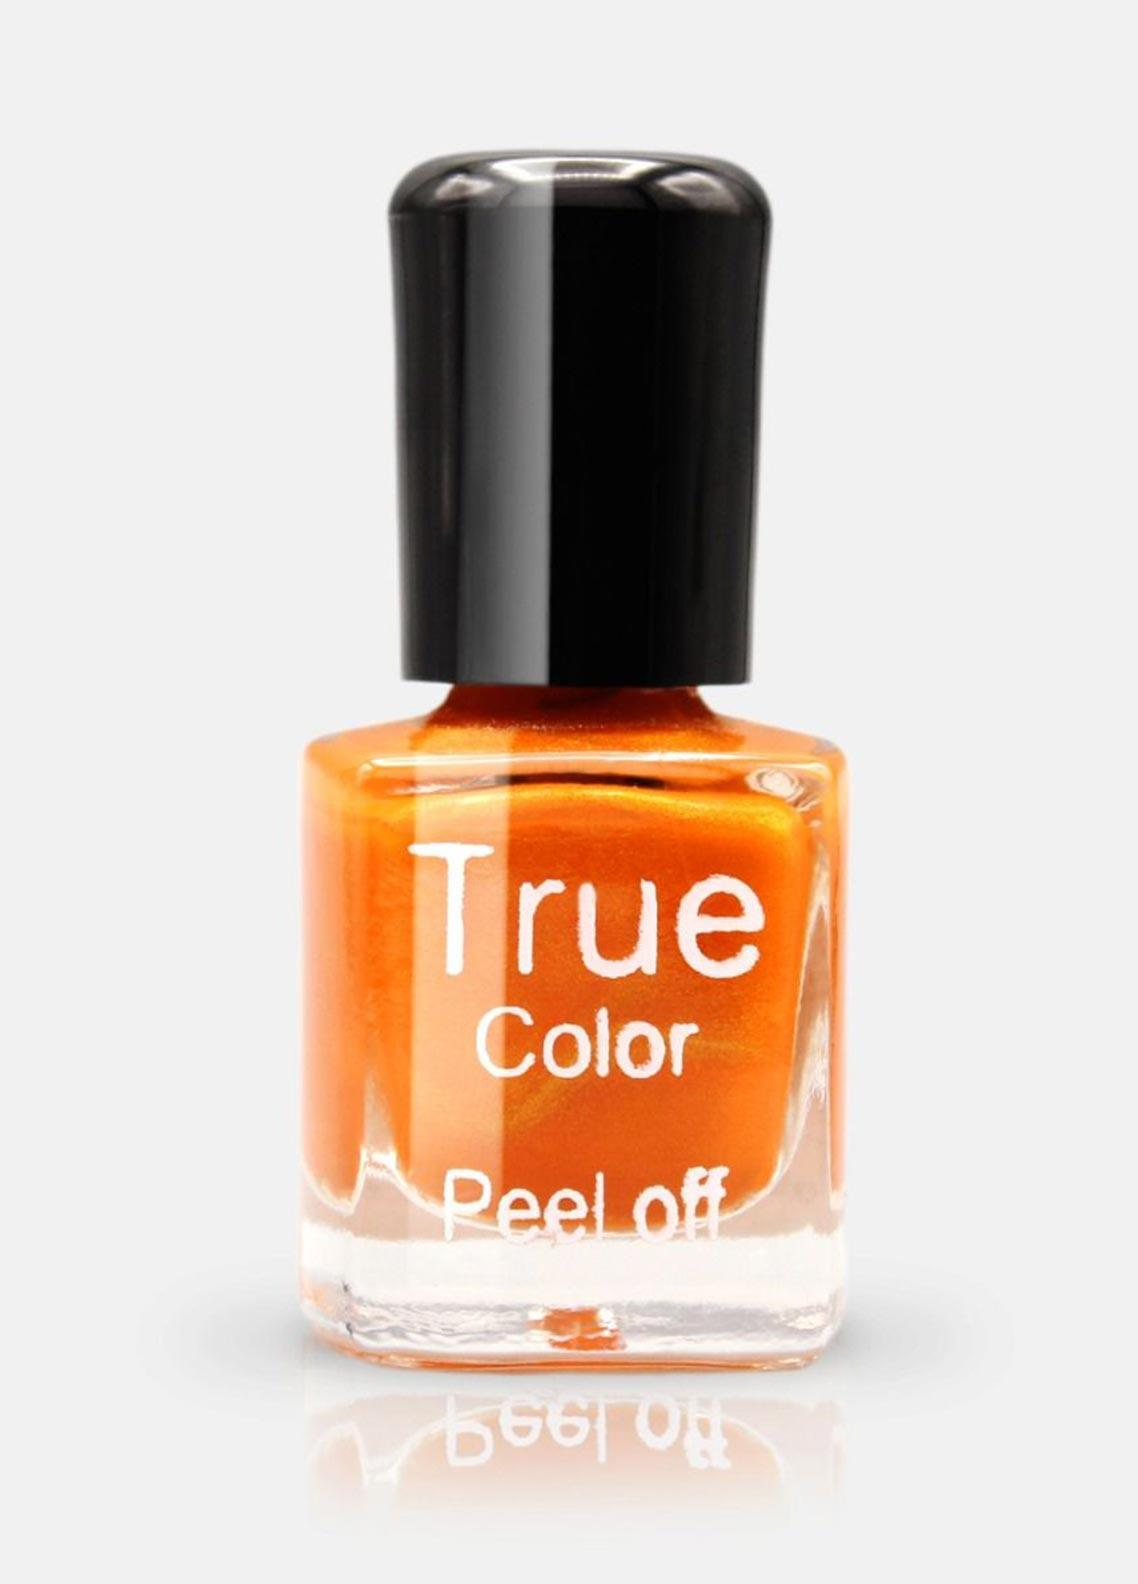 True Colors Peel Of Nail Mask-15